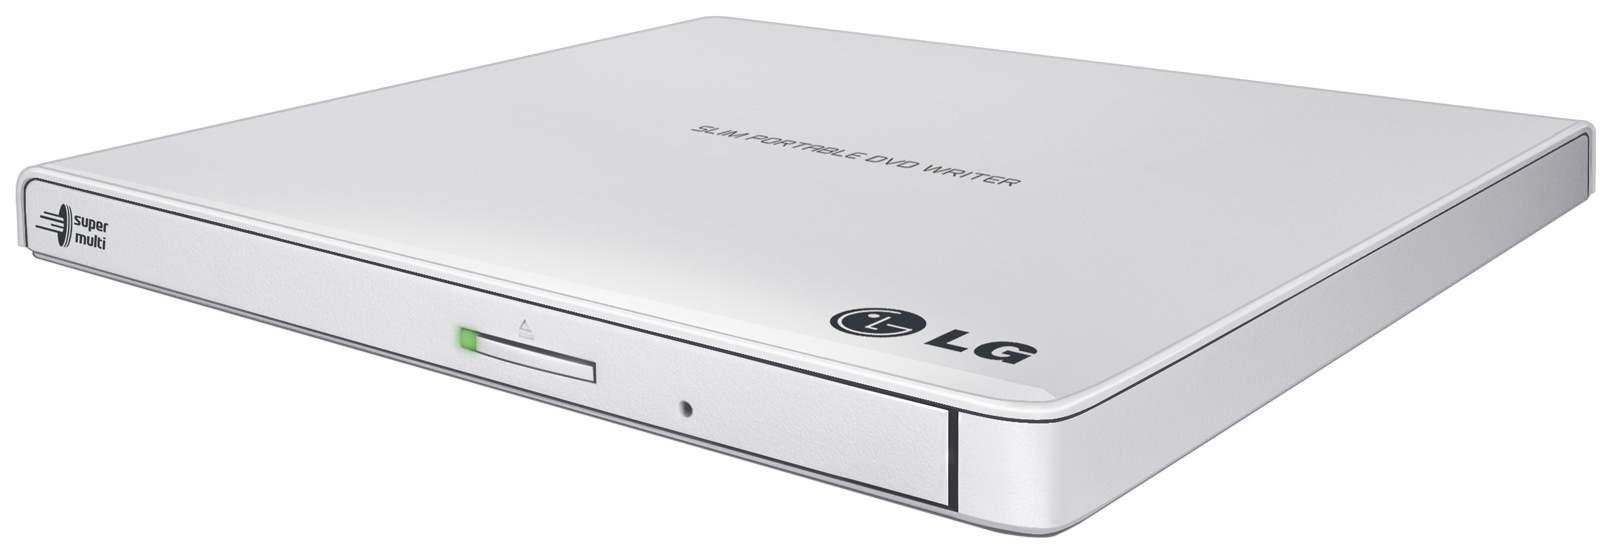 Привод Hitachi-LG Data Storage (GP57EW40) White Retail